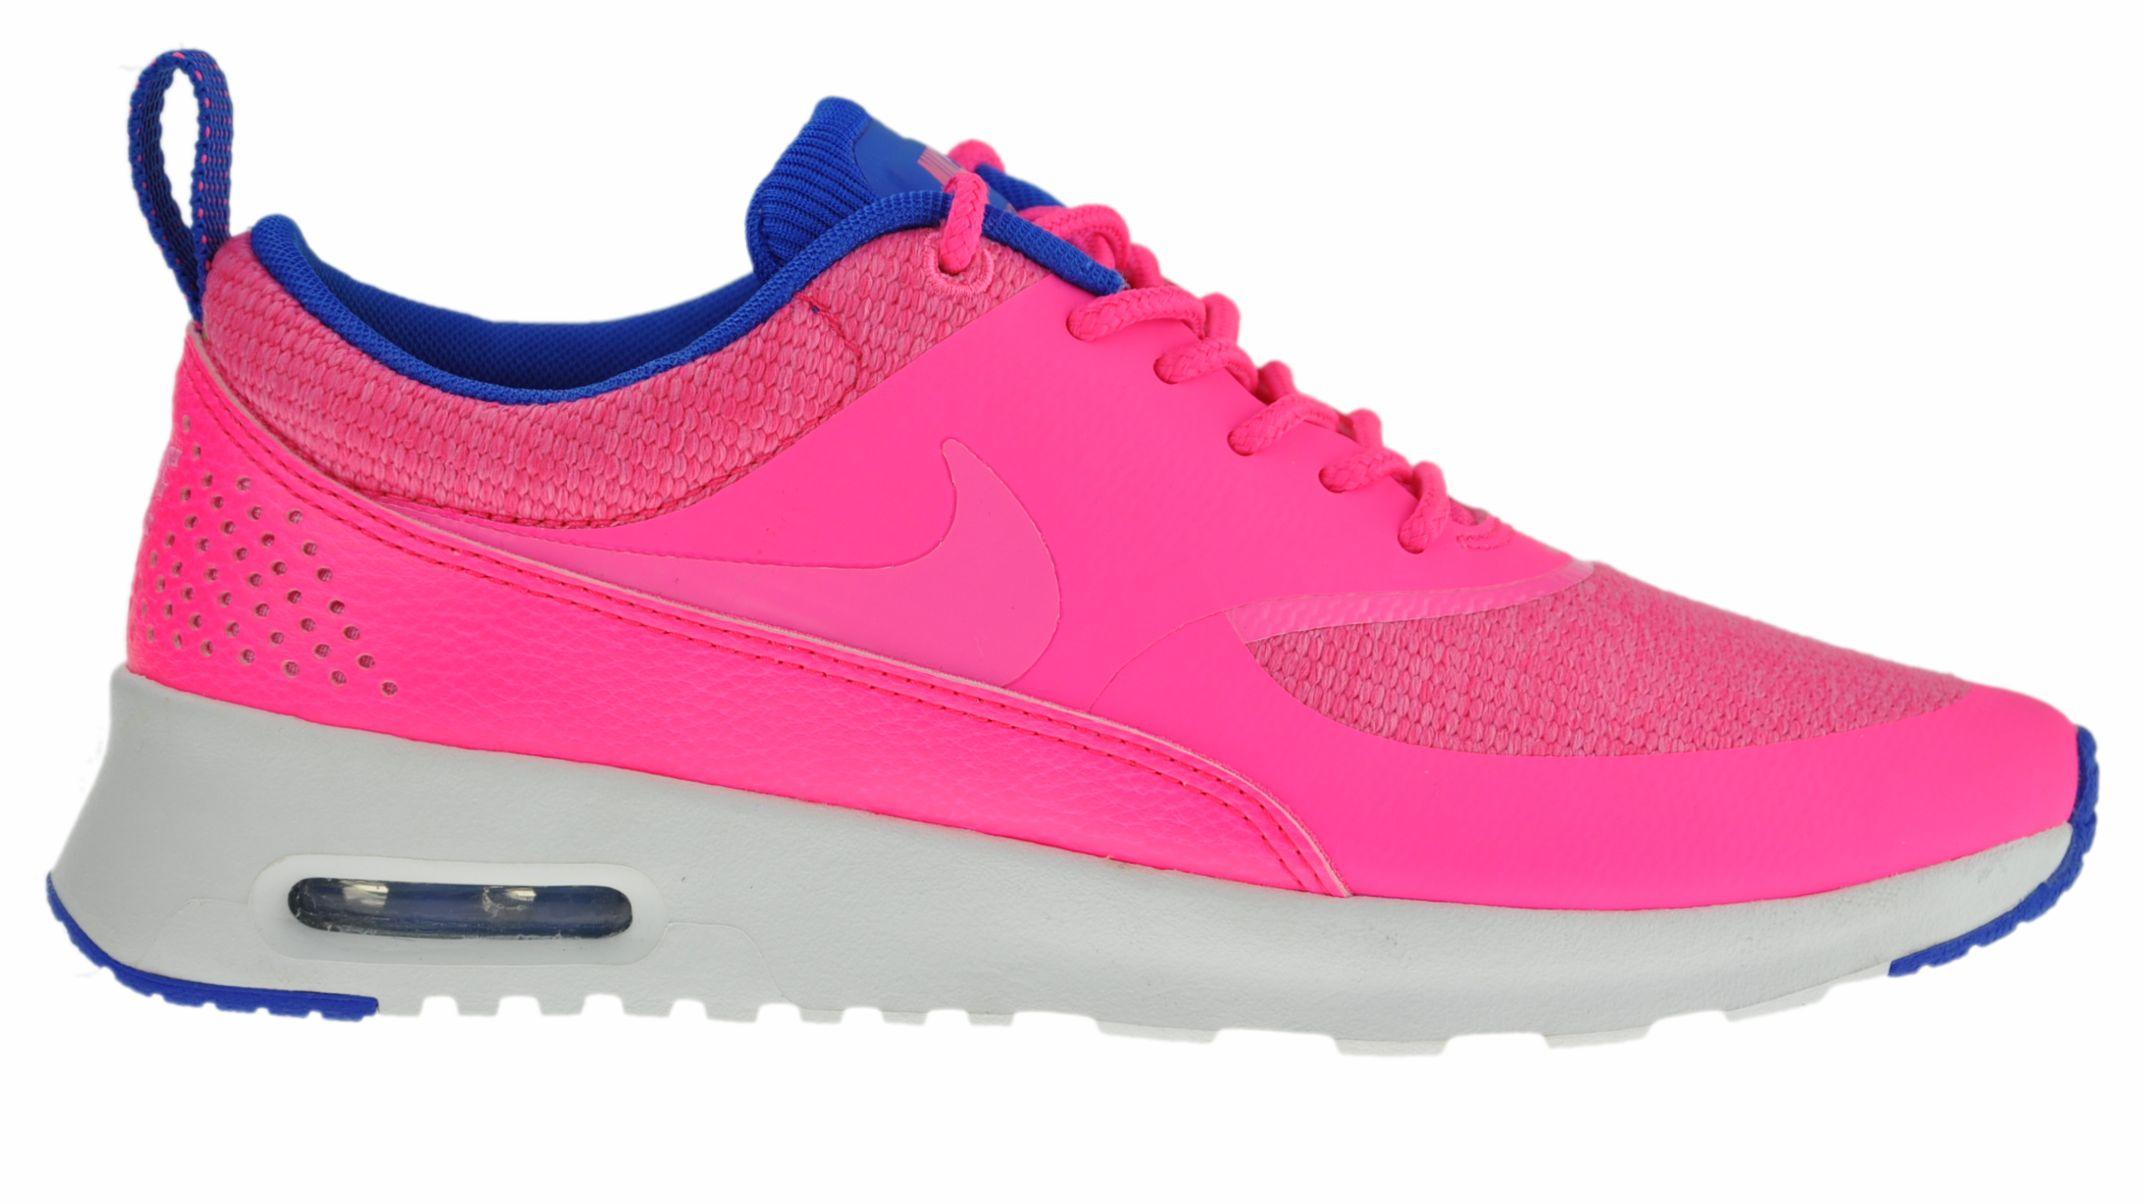 Nike Air Max Thea Prm Wmns 616723 601 Różowe Buty Trampki